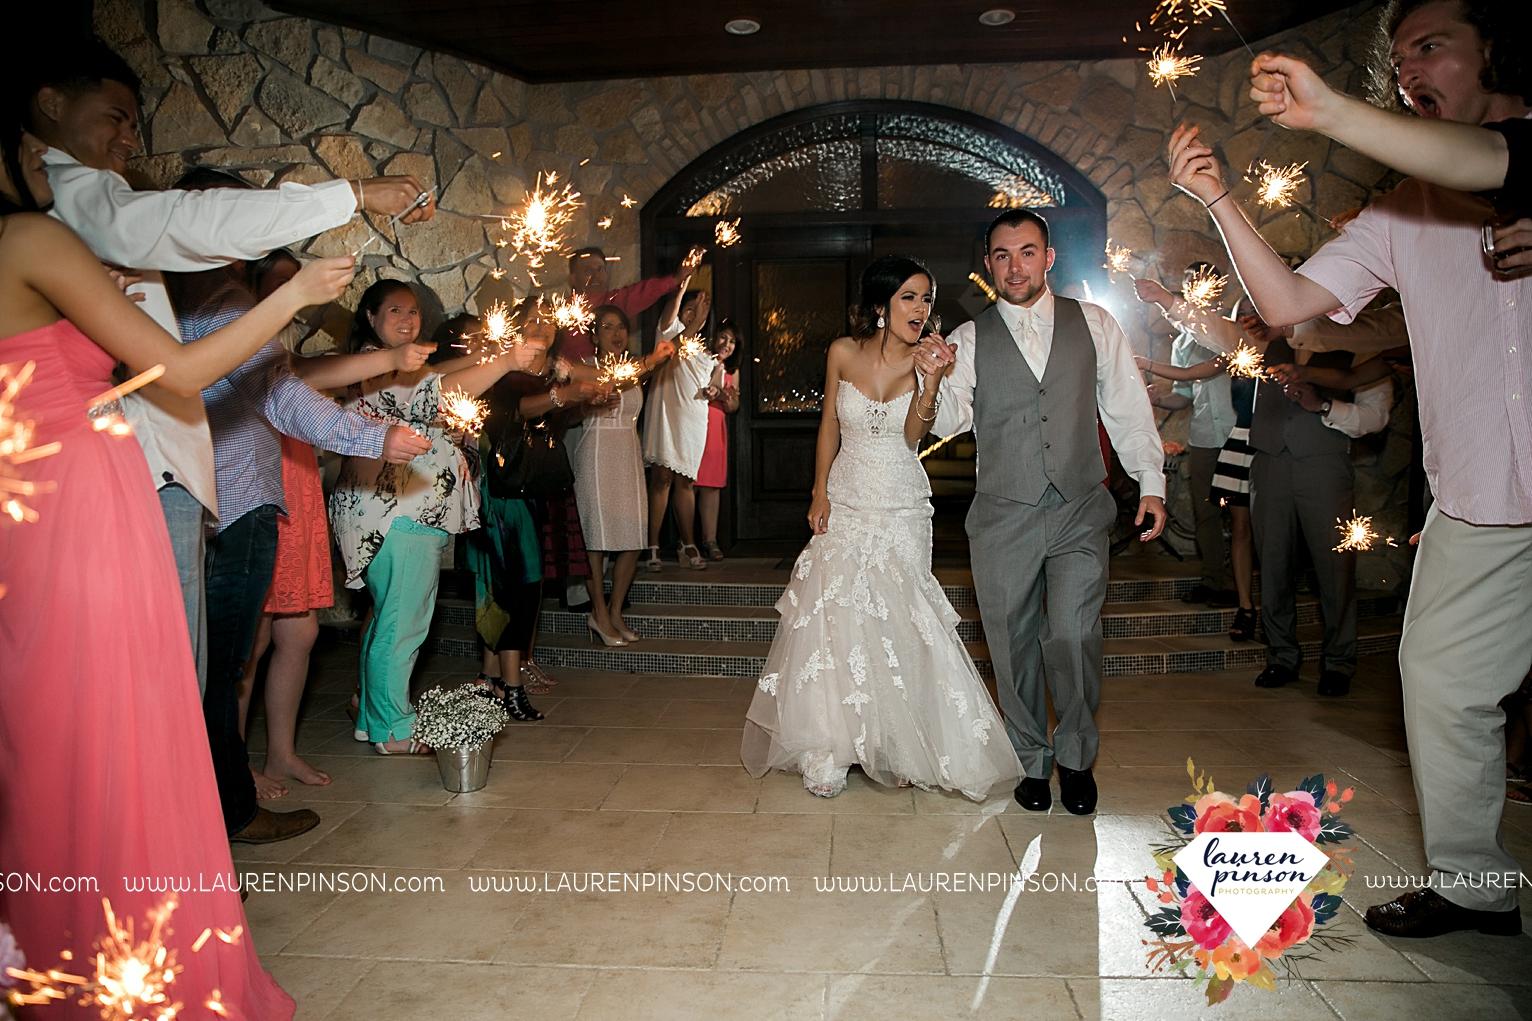 wichita-falls-wedding-nocona-comanche-rose-ranch-rustic-pink-gray-photography-00190.jpg